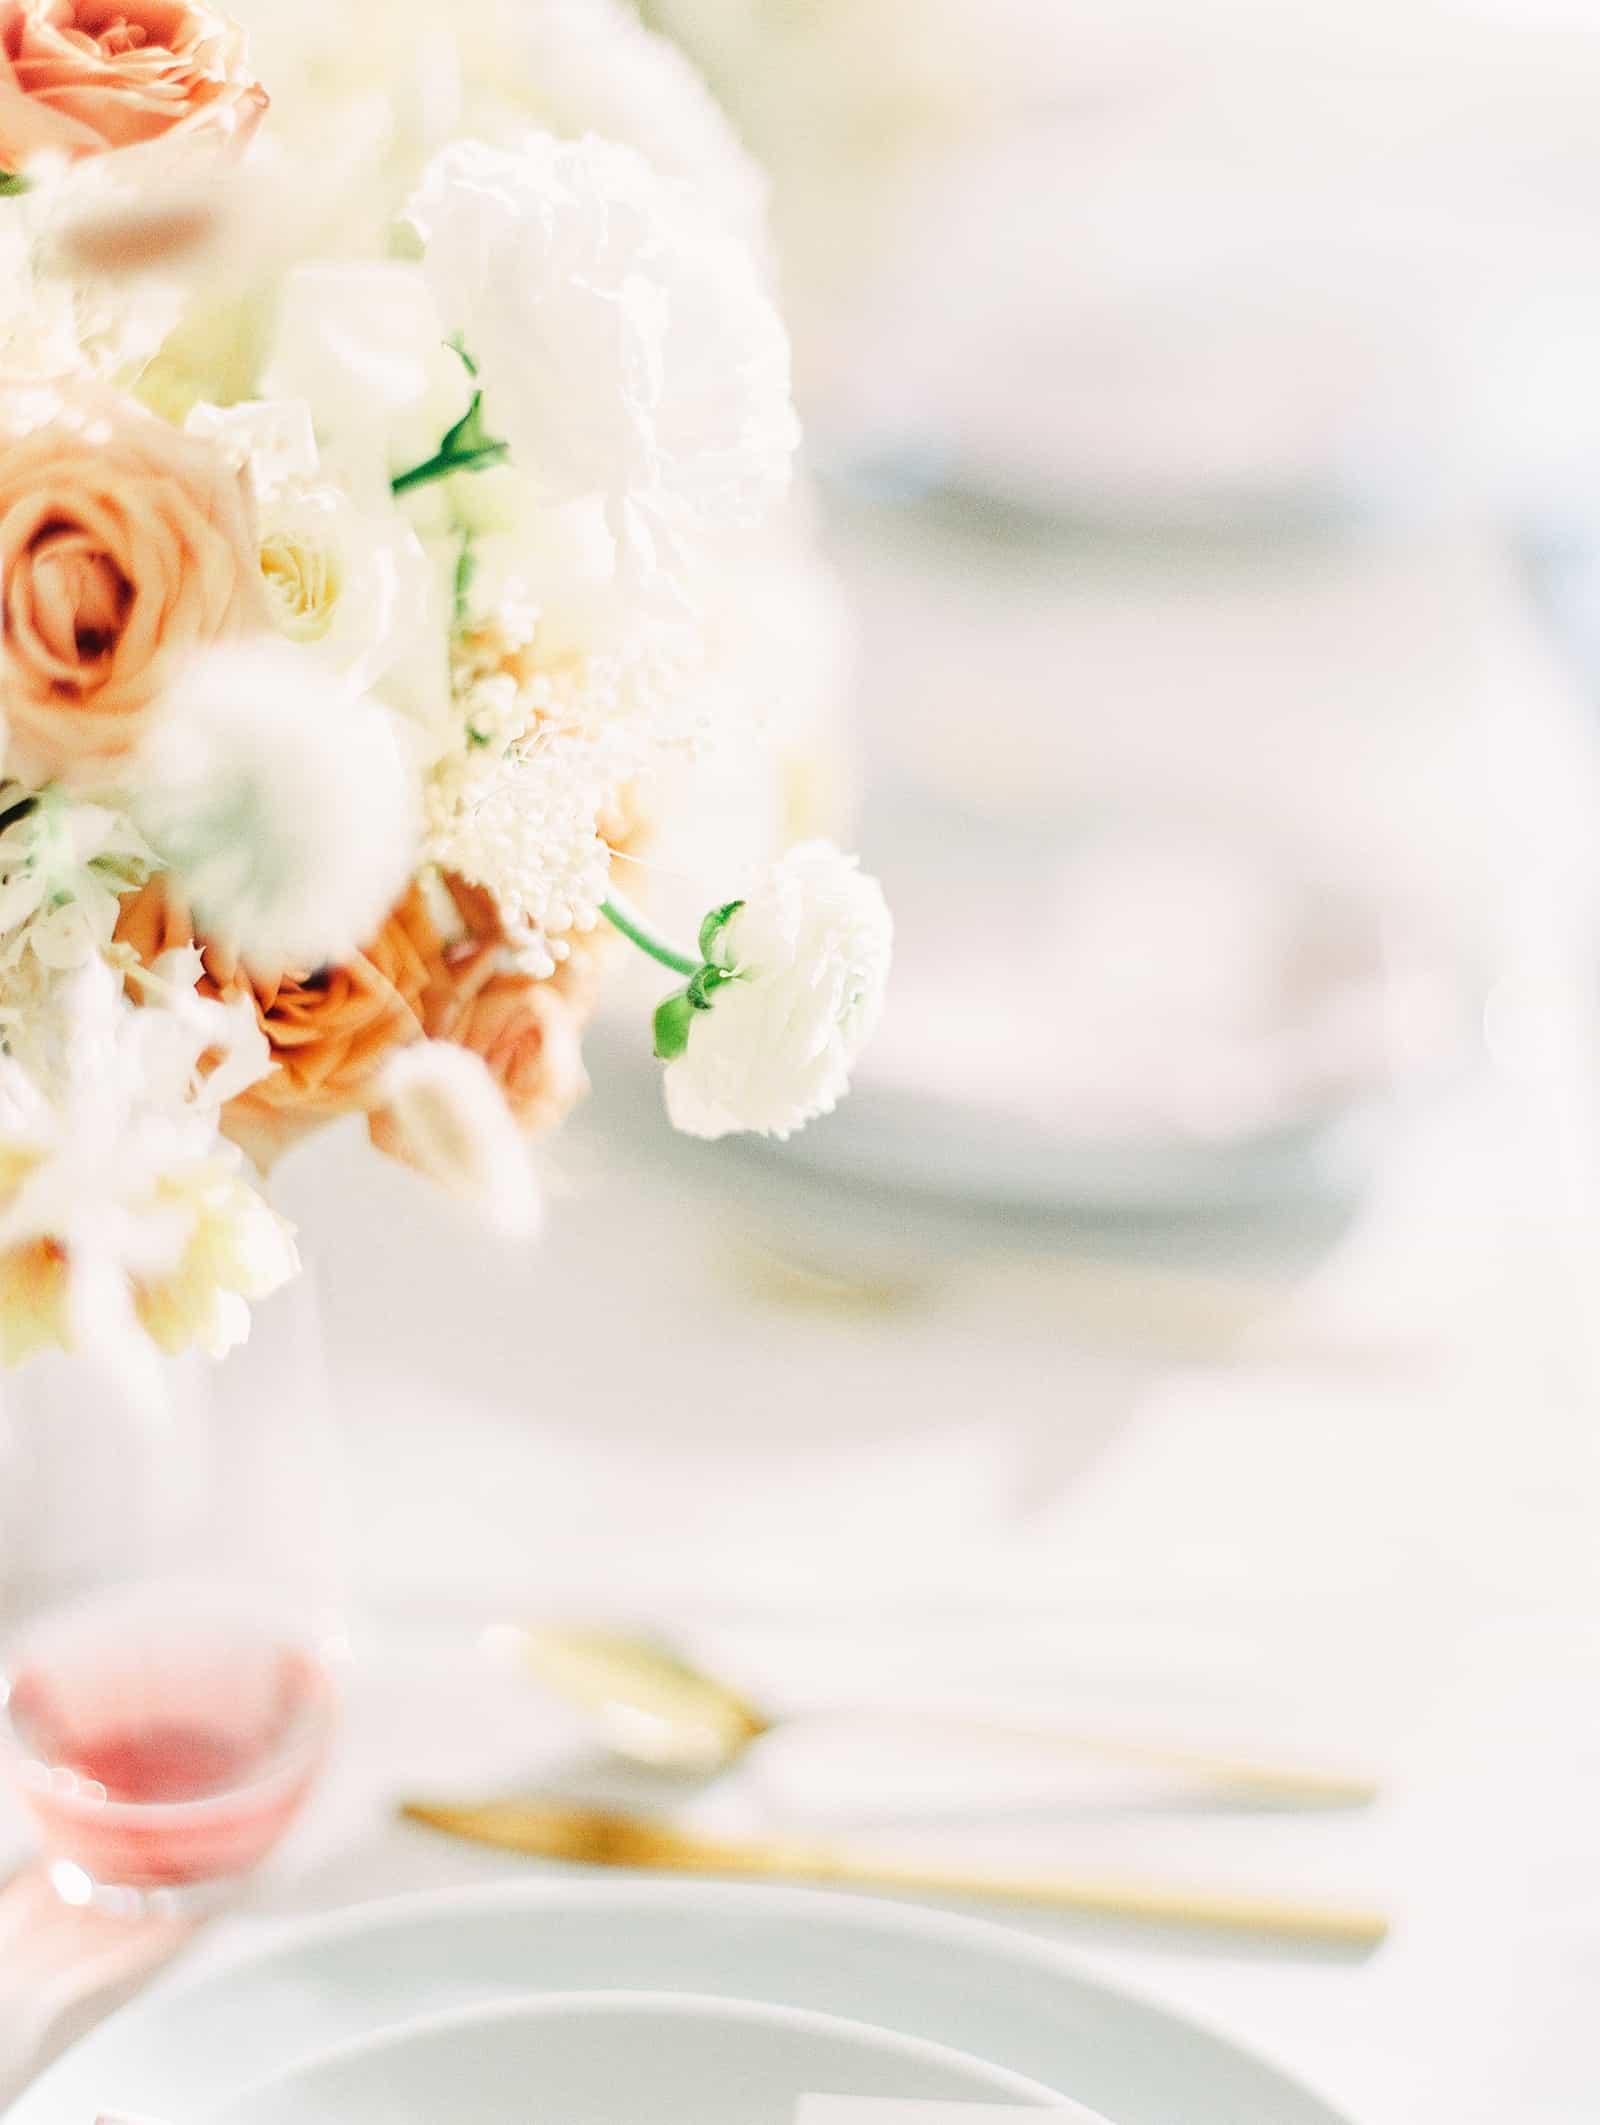 Modern wedding table with white and orange flower centerpiece